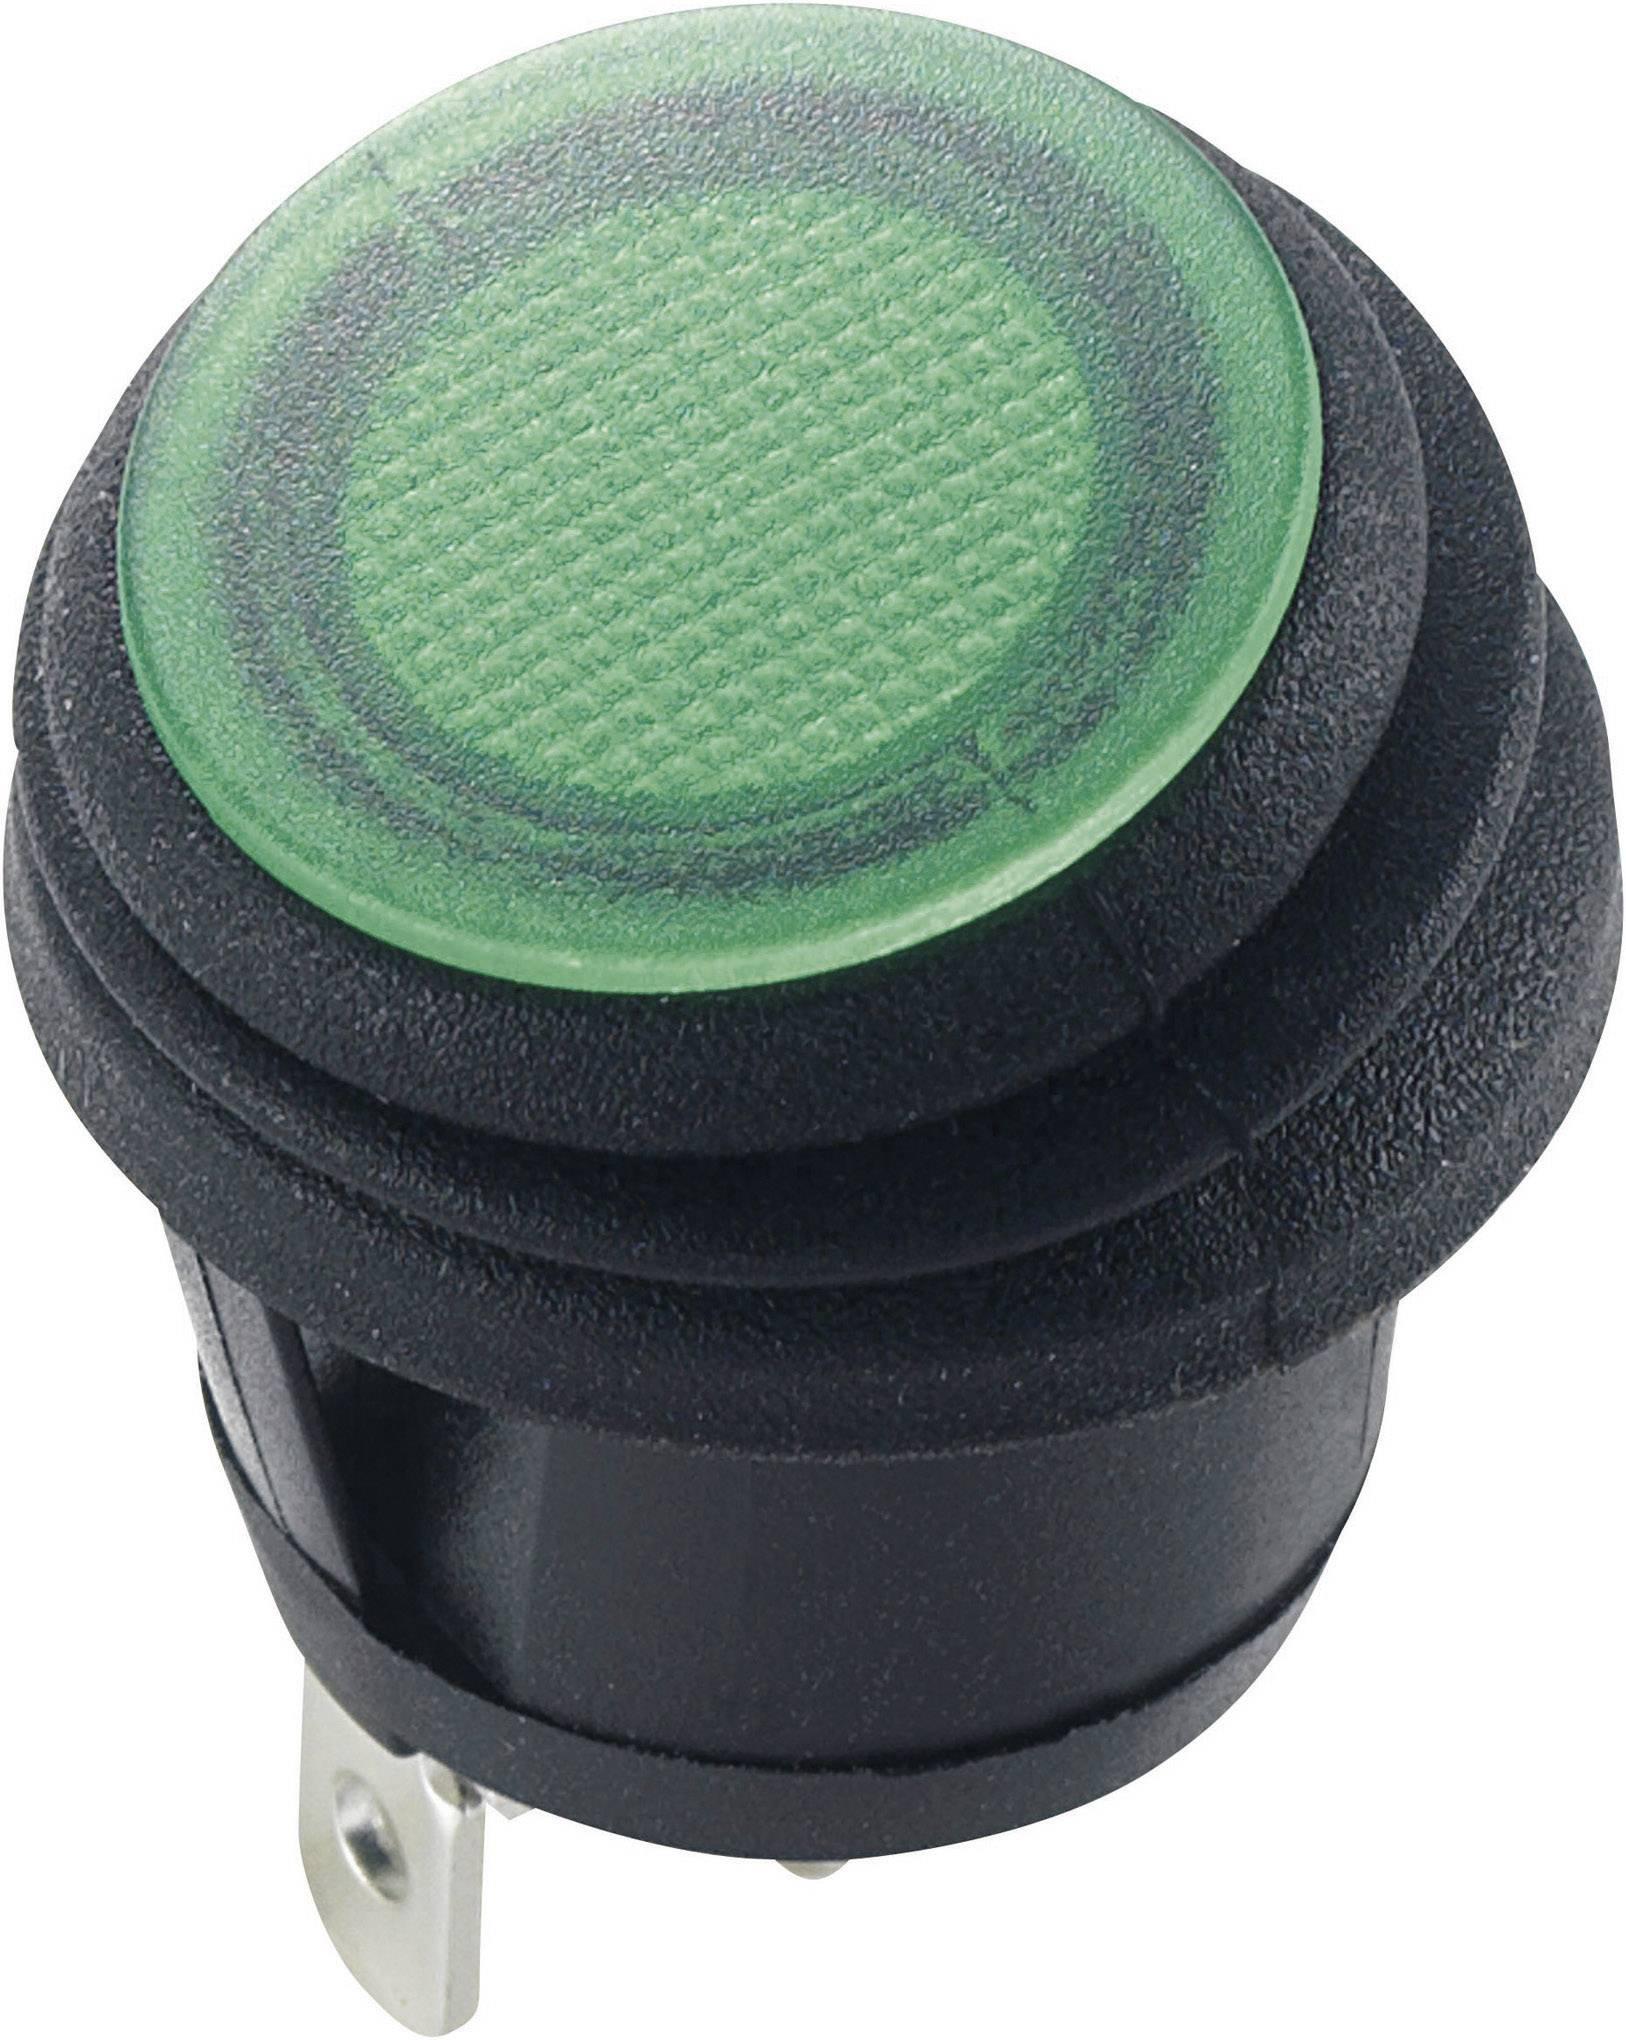 Tlačítkový spínač SCI, R13-112B8W, 12 V/DC, 20 A, IP65, 1x zap./vyp., zelená